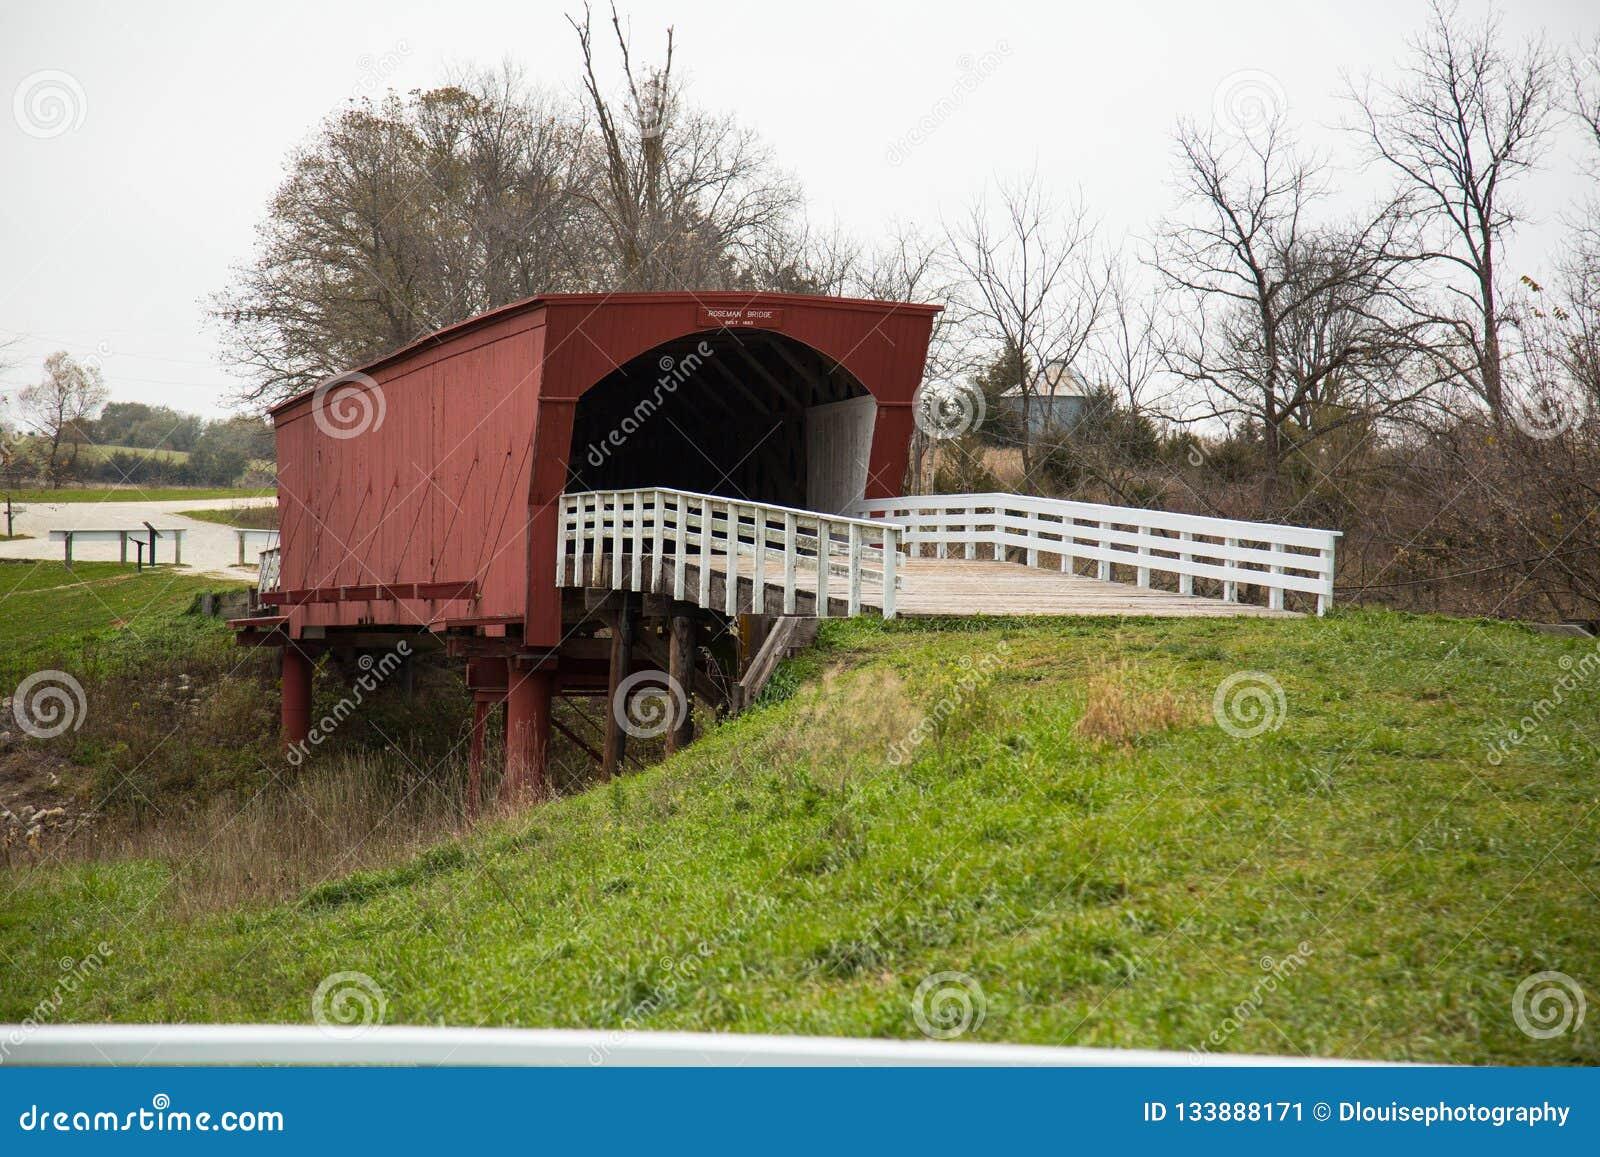 Bridges of Madison County covered bridge